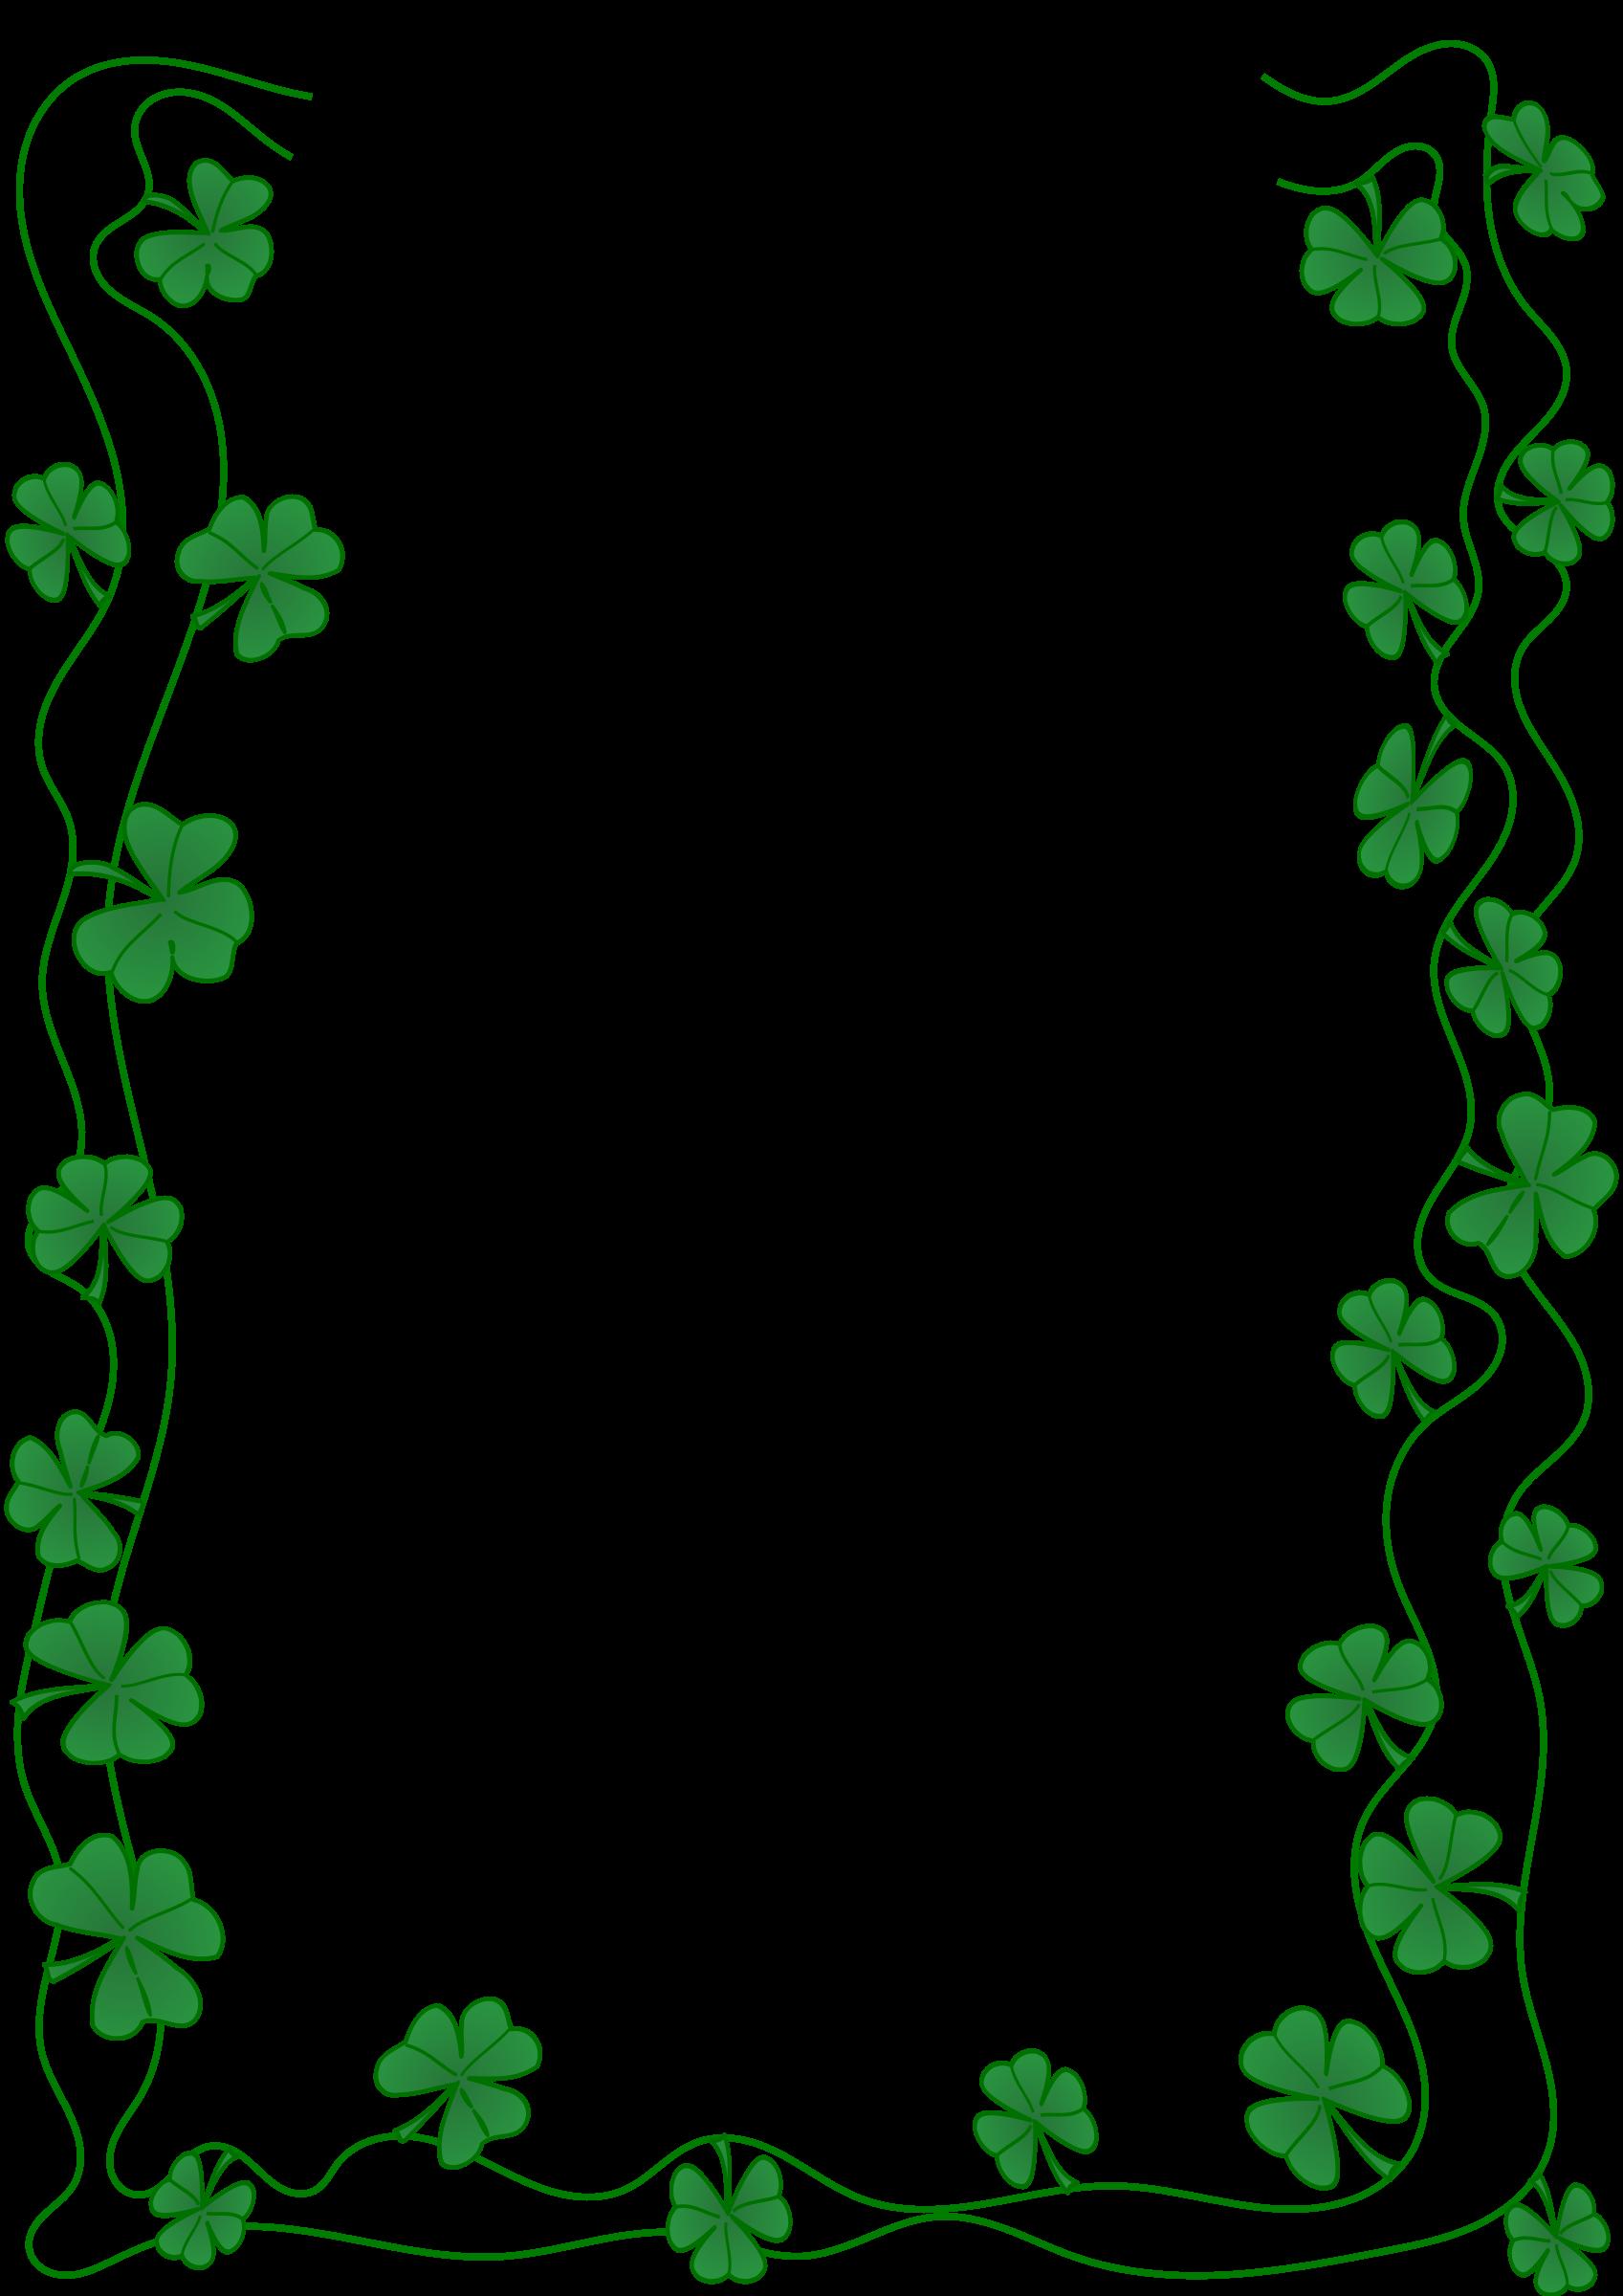 St Patrick S Day Border St Patricks Day Clipart St Patricks Day Saint Patricks Day Art